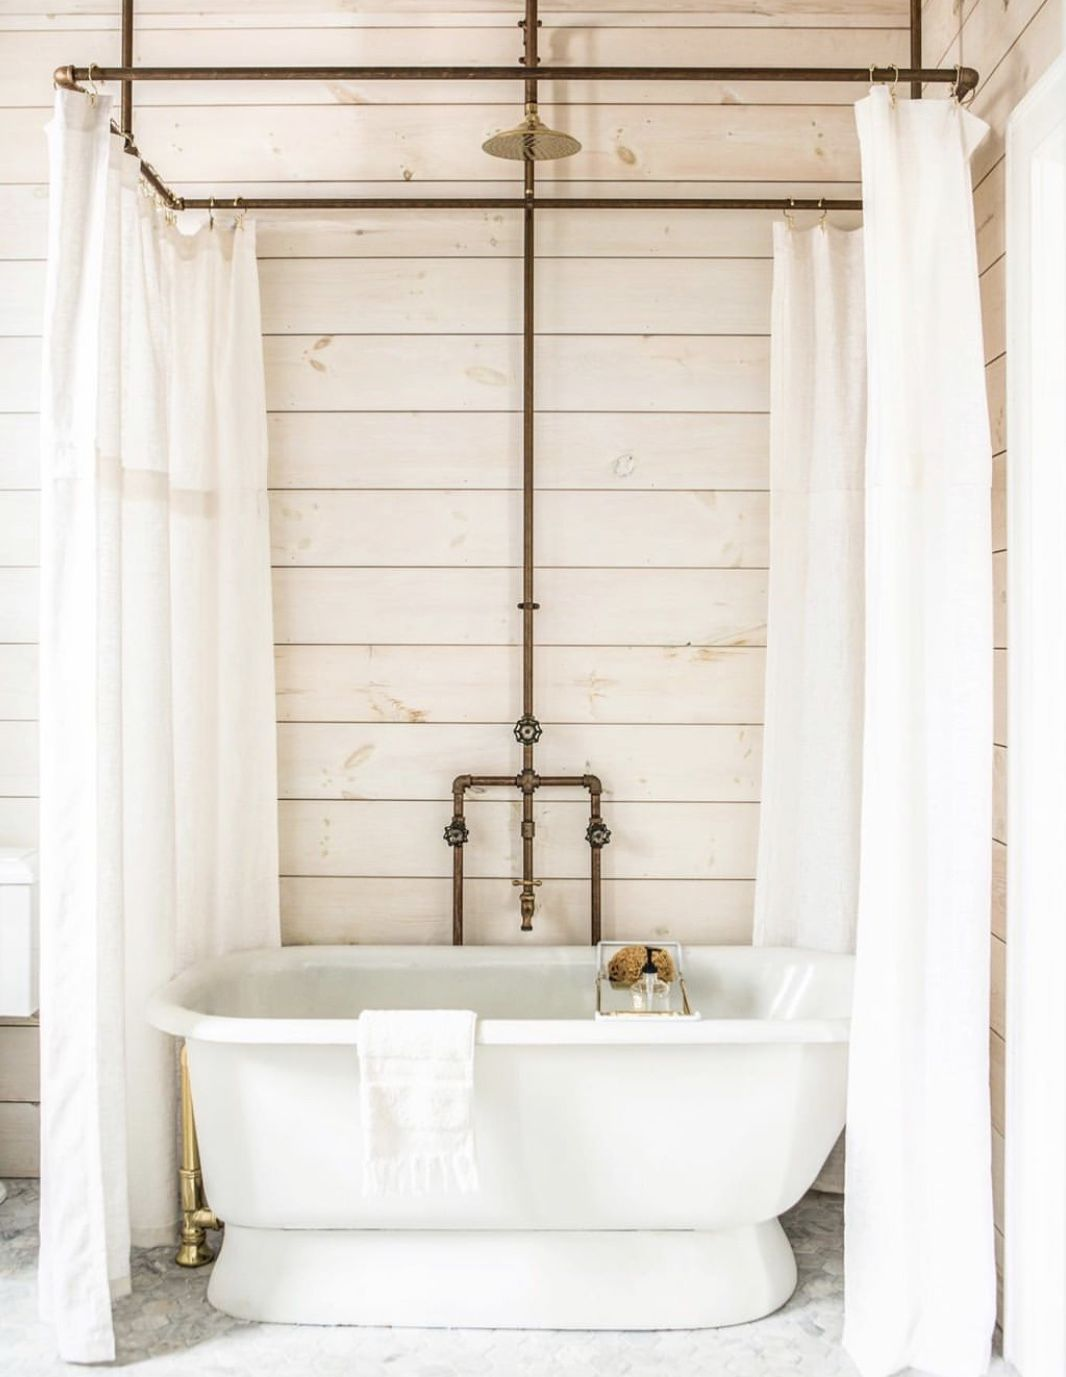 Pin By Jim Dye On Bathroom Diy Shower Curtain Diy Curtain Rods